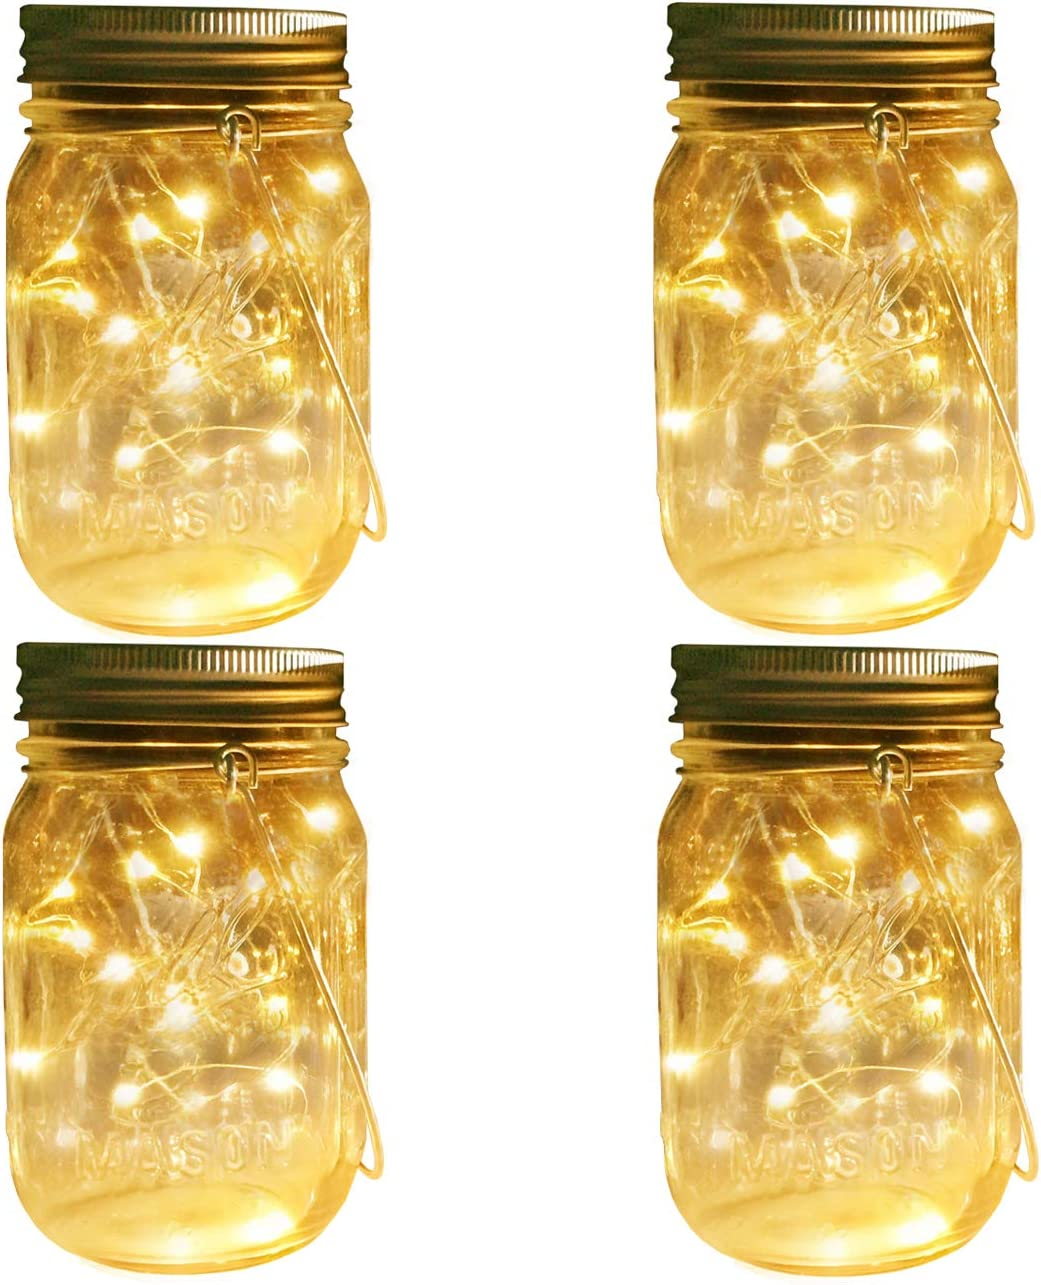 Mason Jar Solar Lights Lanterns, 4 Pack 30 LEDs Fairy Firefly Led String Lights with Glass Mason Jar,Best for Wedding Garden Patio Outdoor Solar Powered Hanging Lanterns Jars Hangers Included